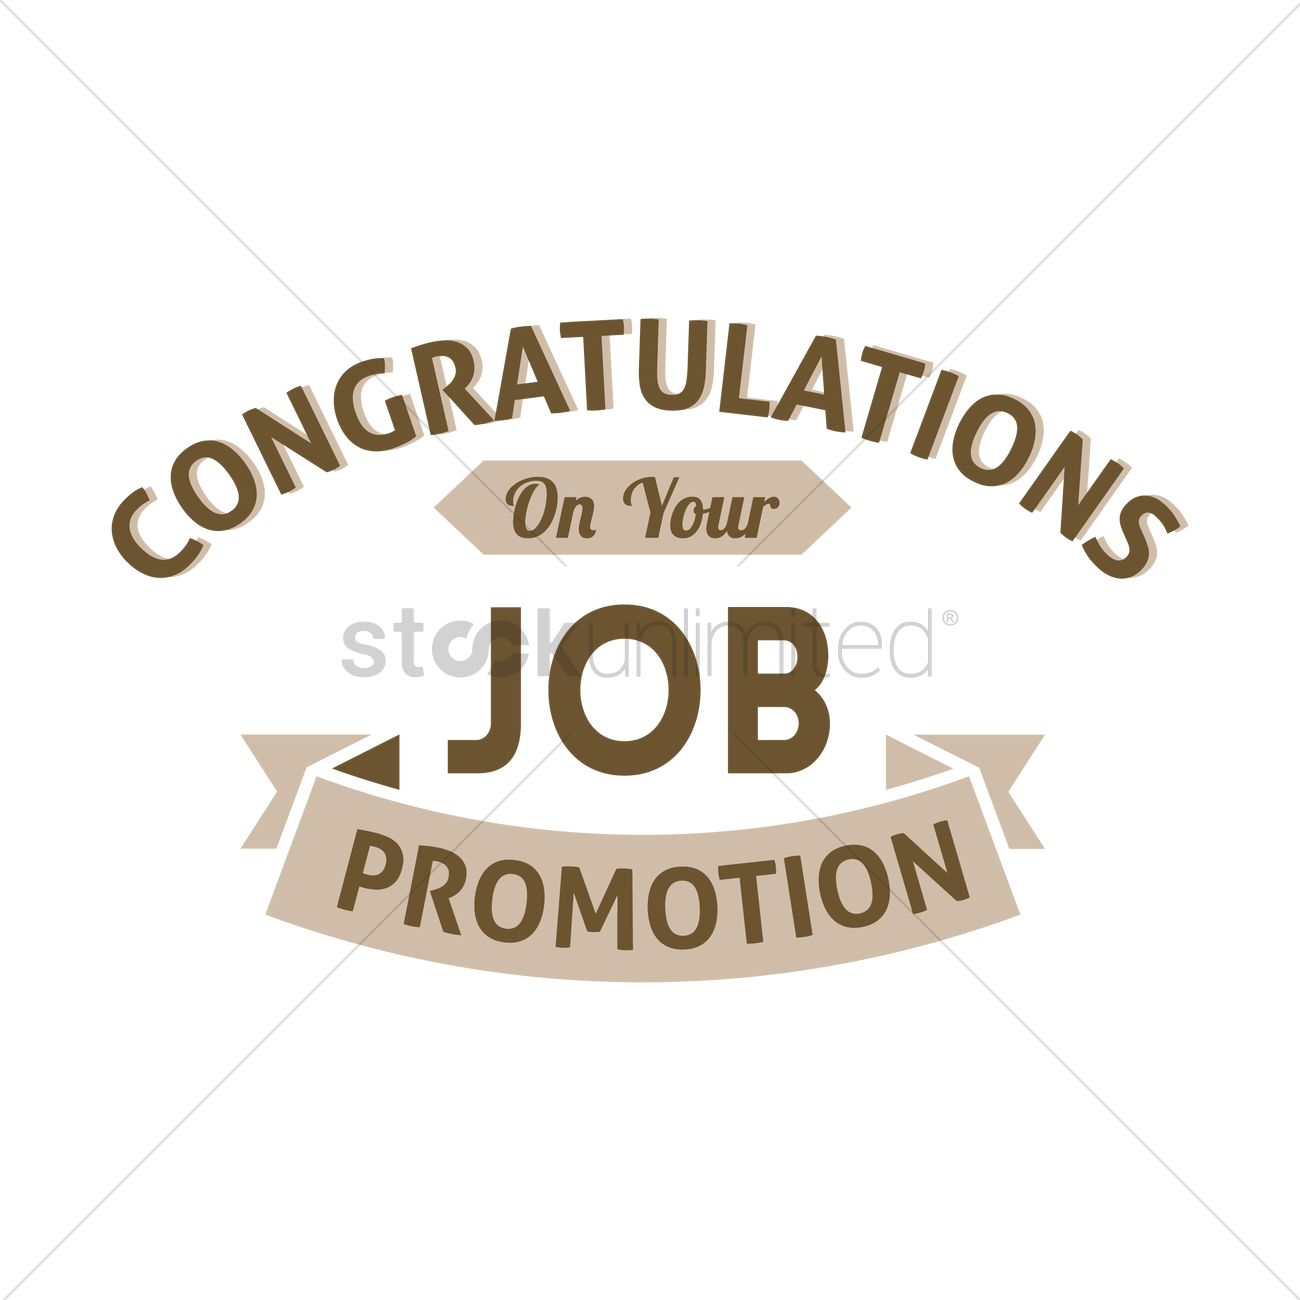 Congratulation job promotion wish Vector Image.